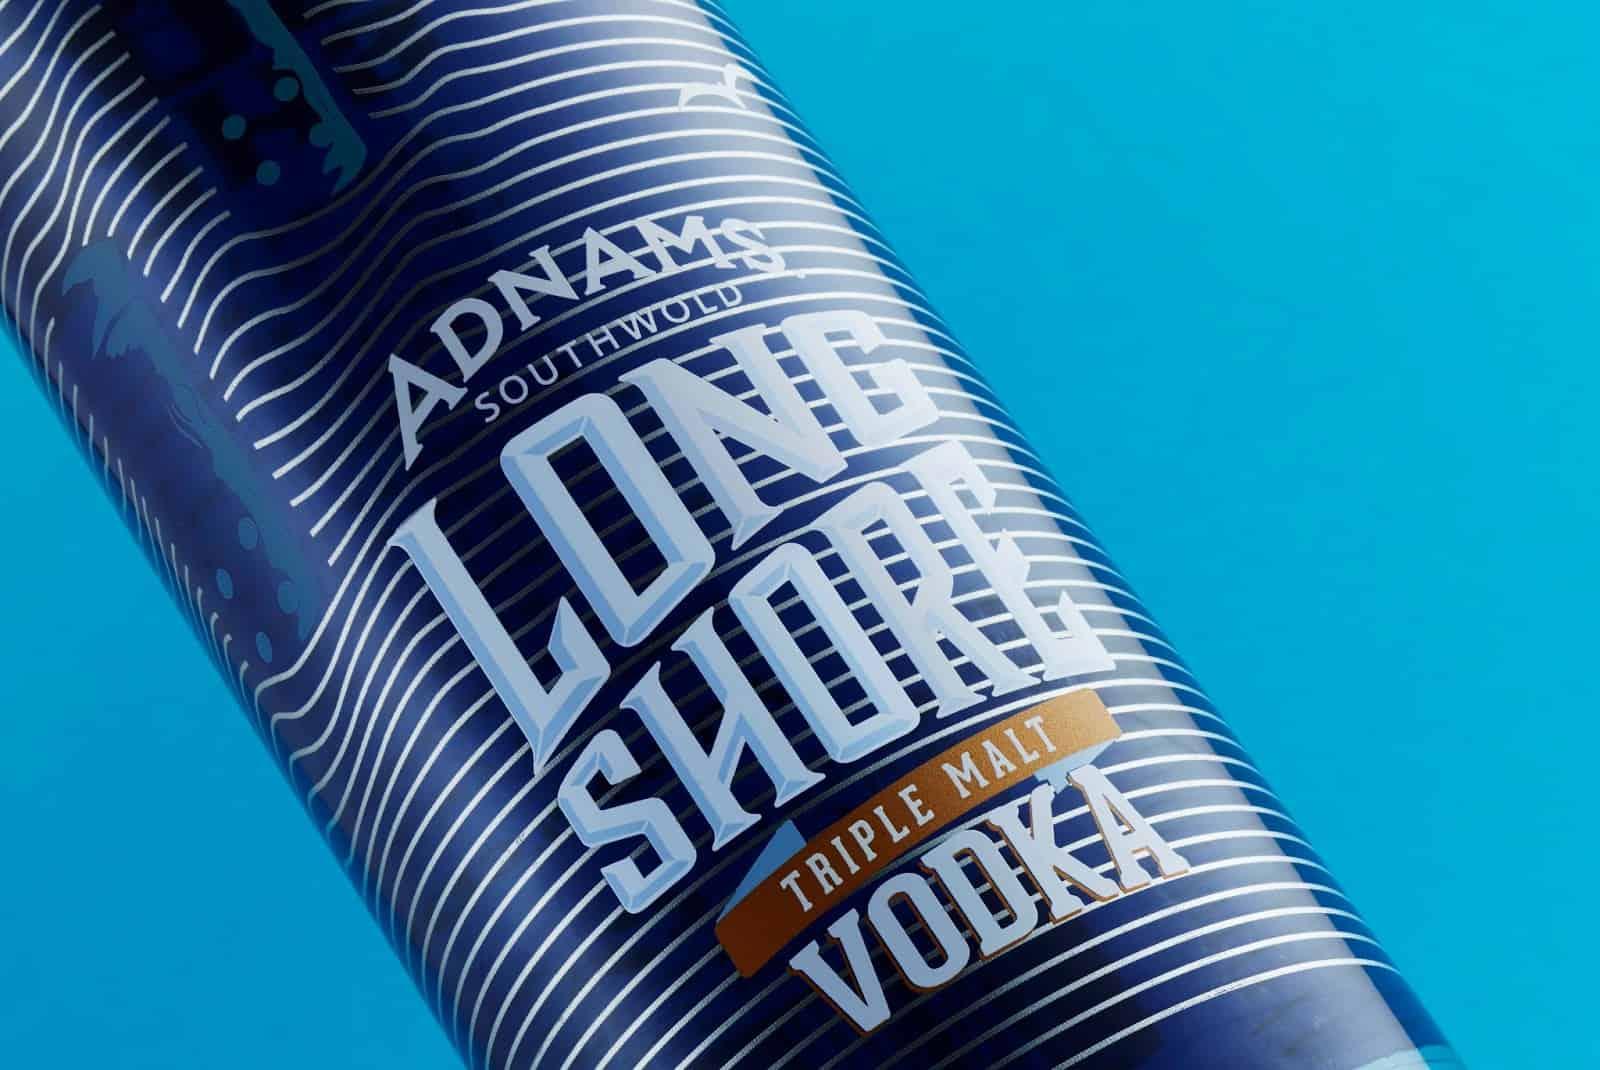 Adnams Longshore – vodka